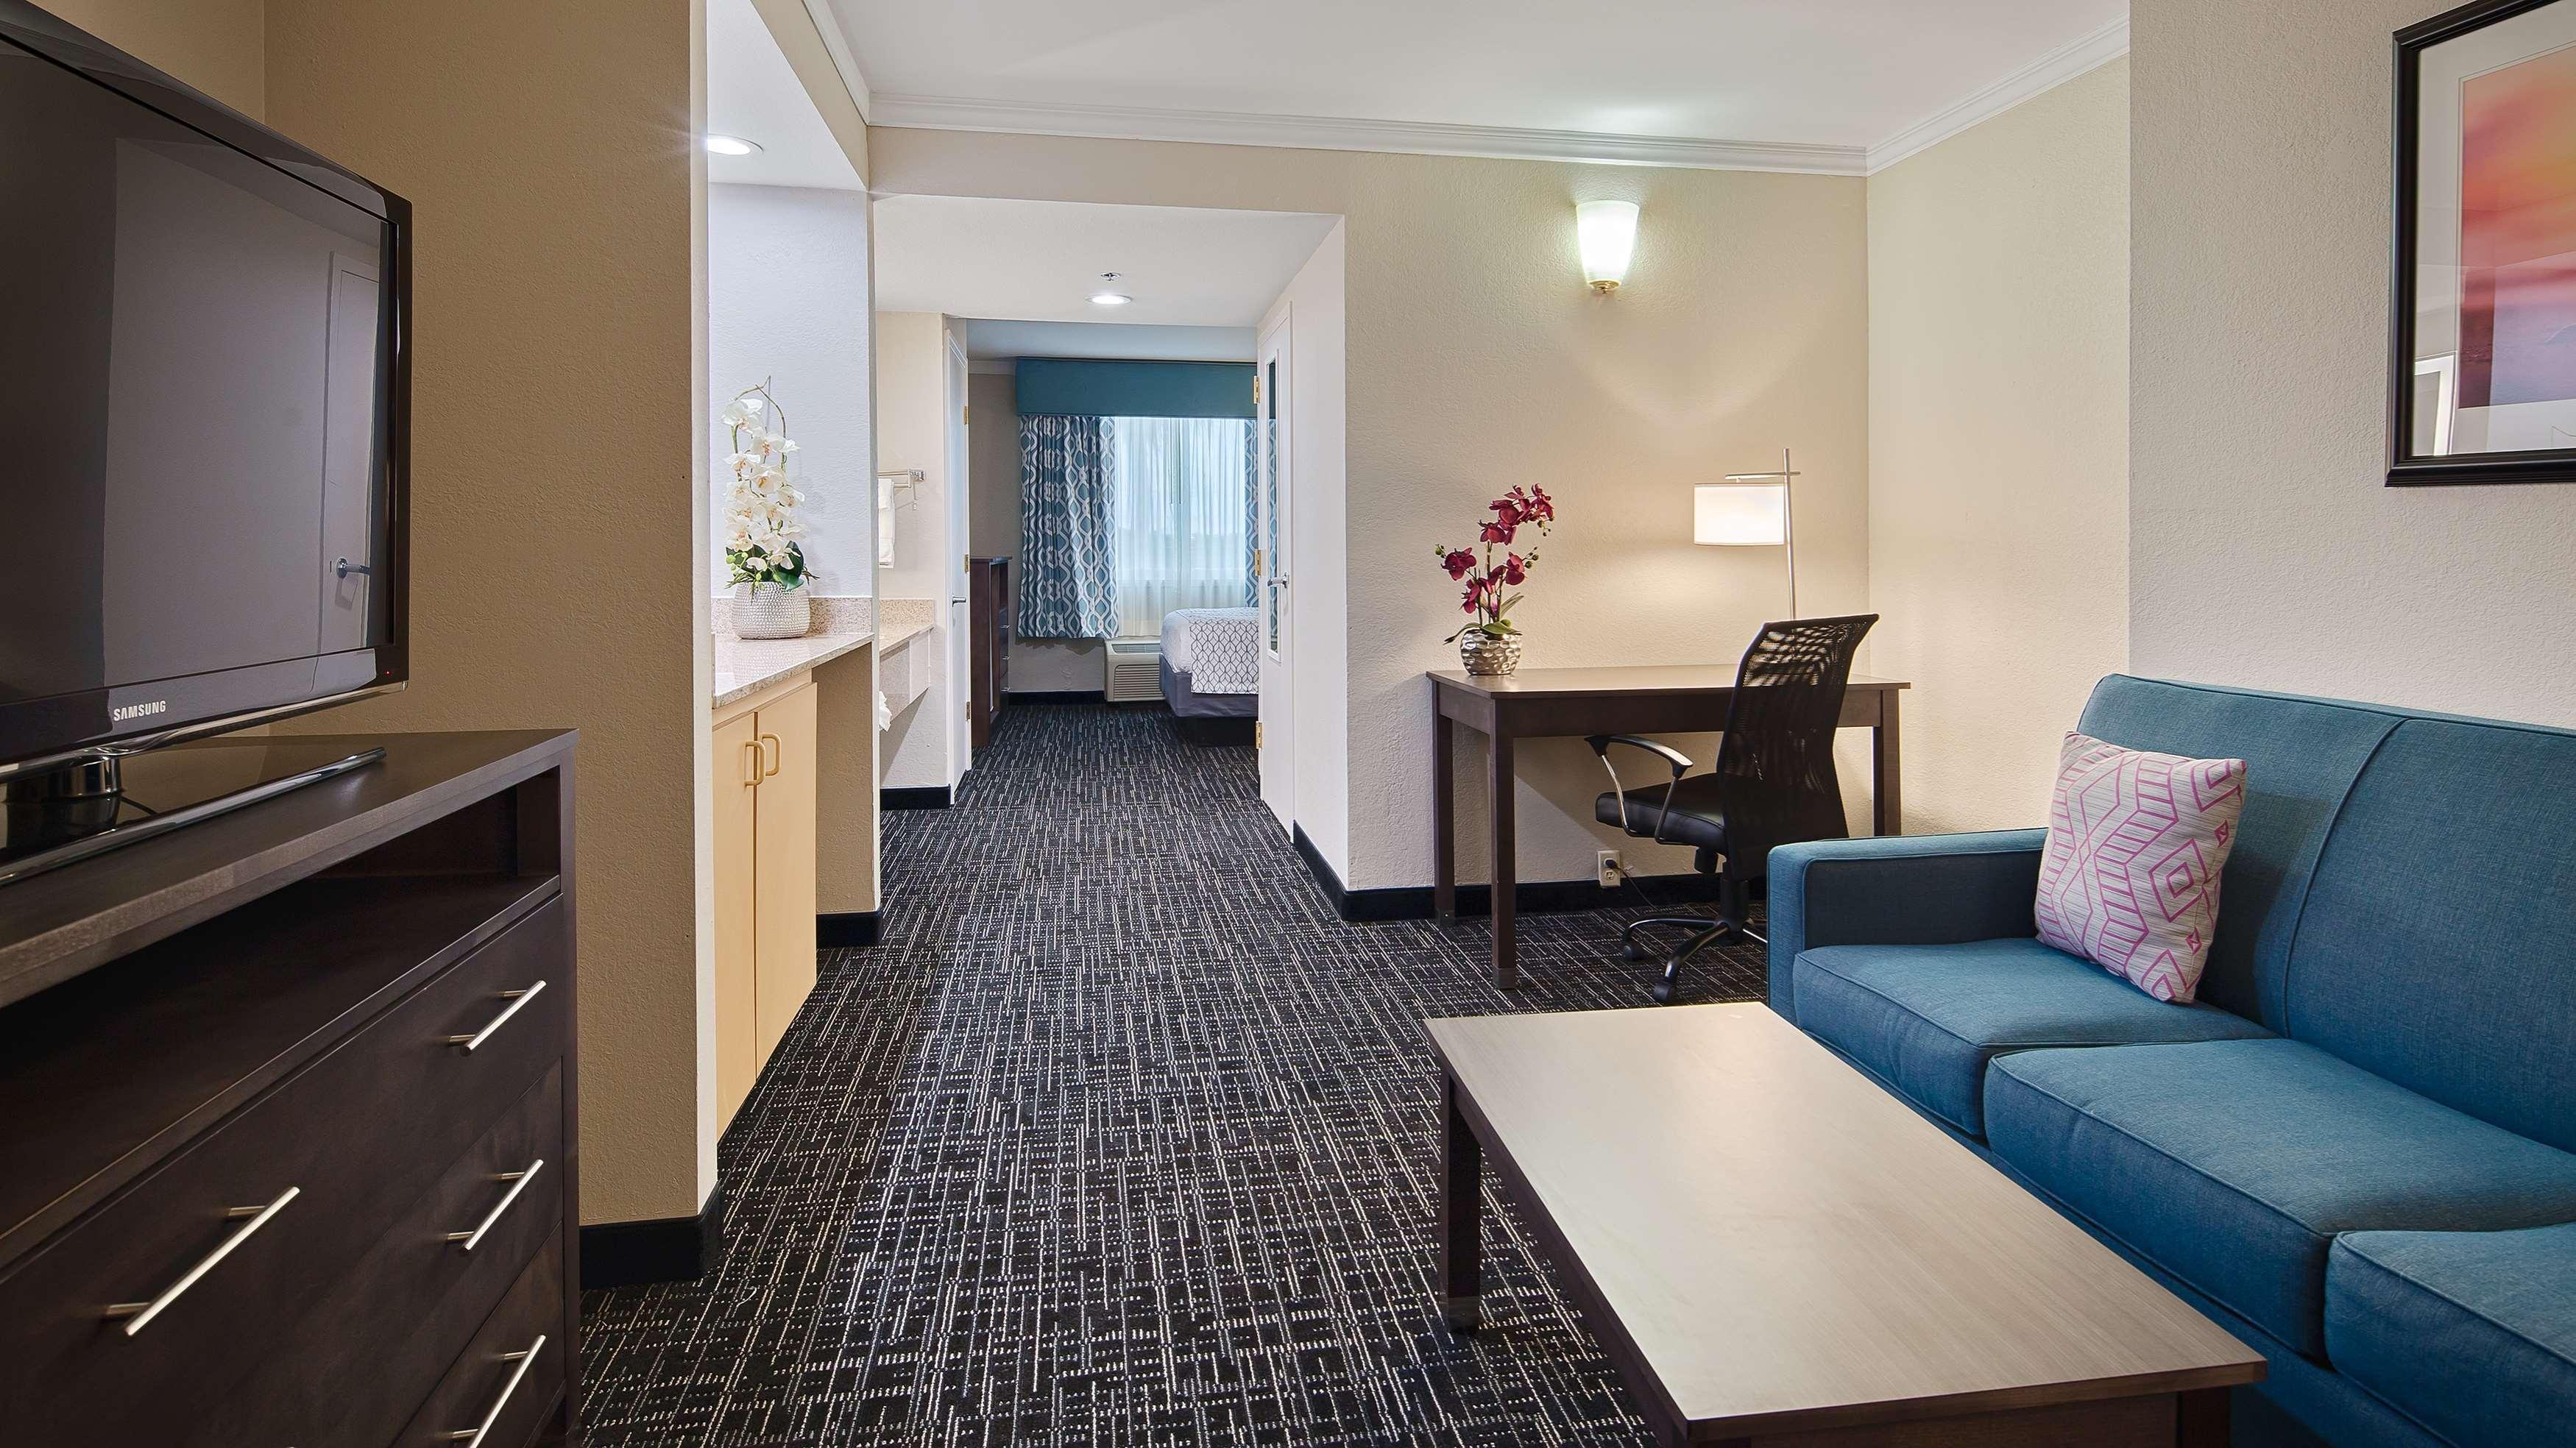 Best Western Fort Myers Inn & Suites image 12